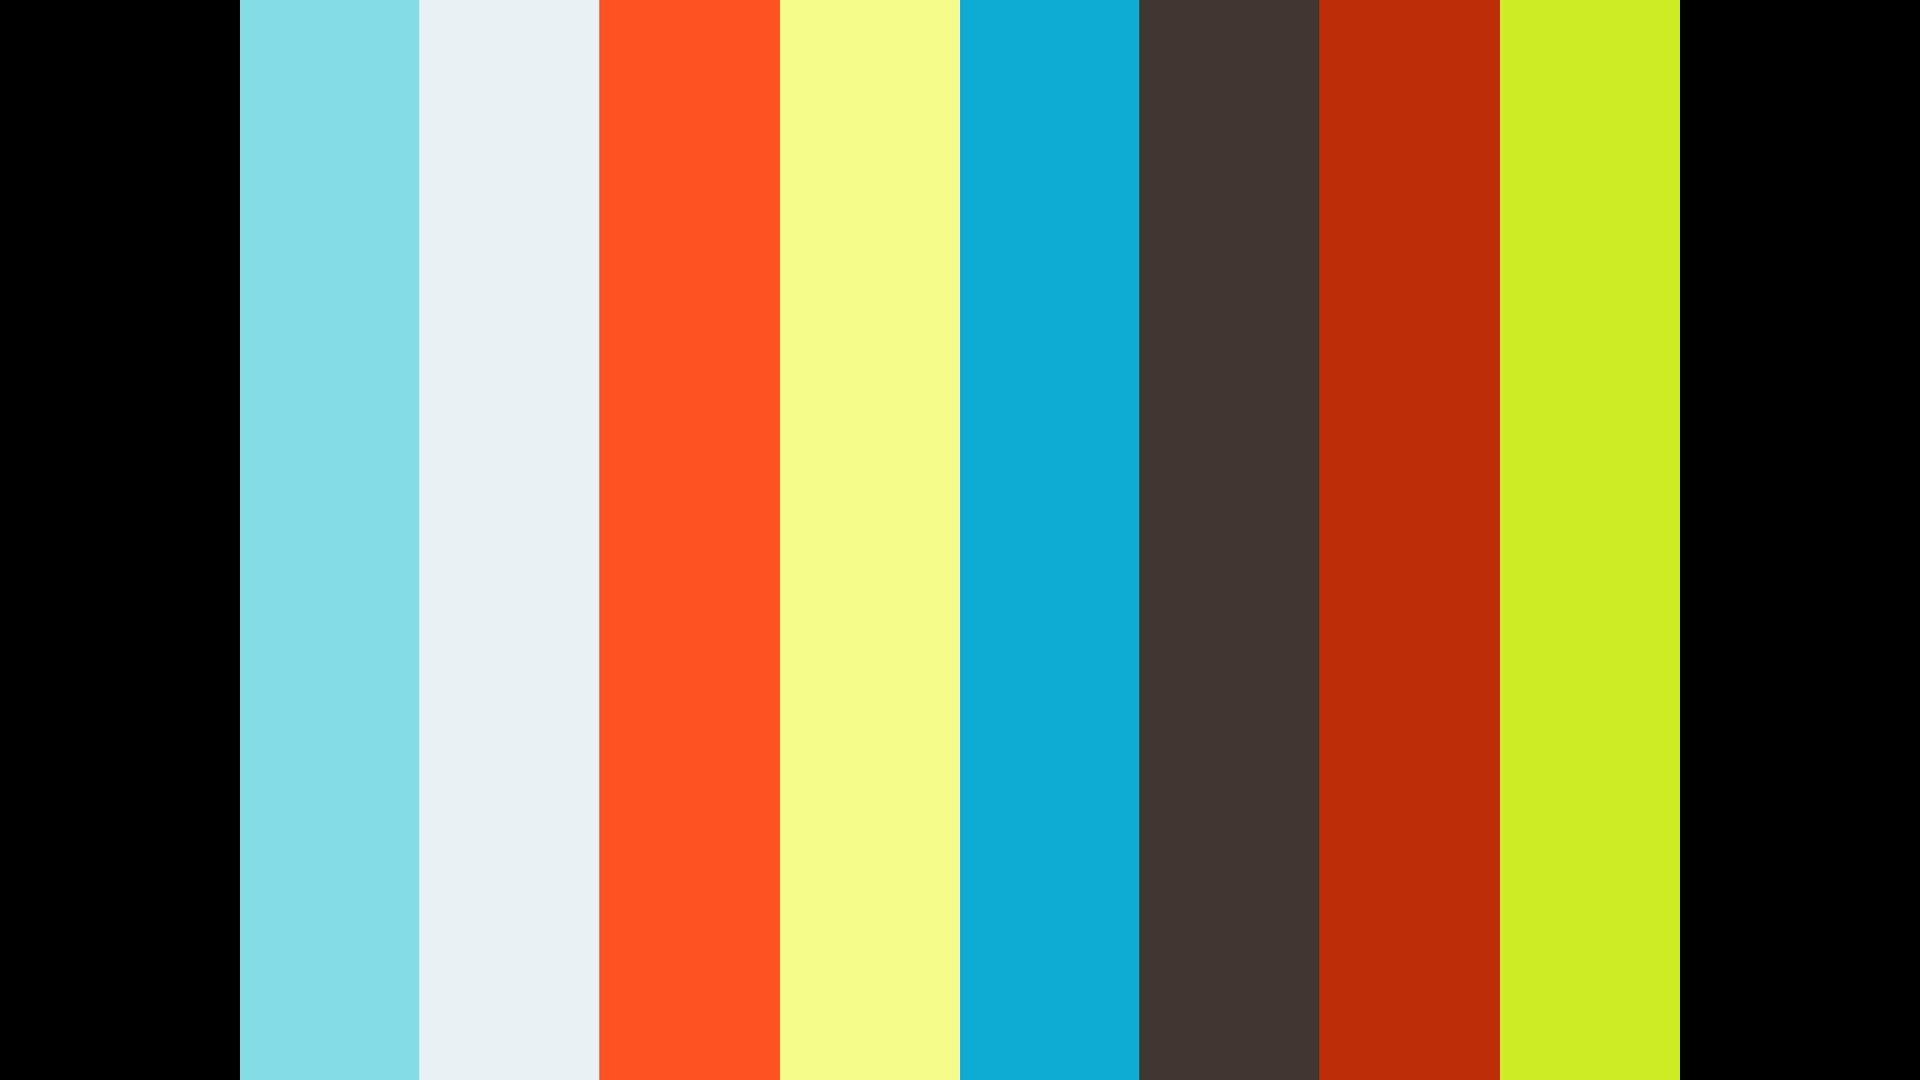 Compera TV Commercial Comparison V2 2020